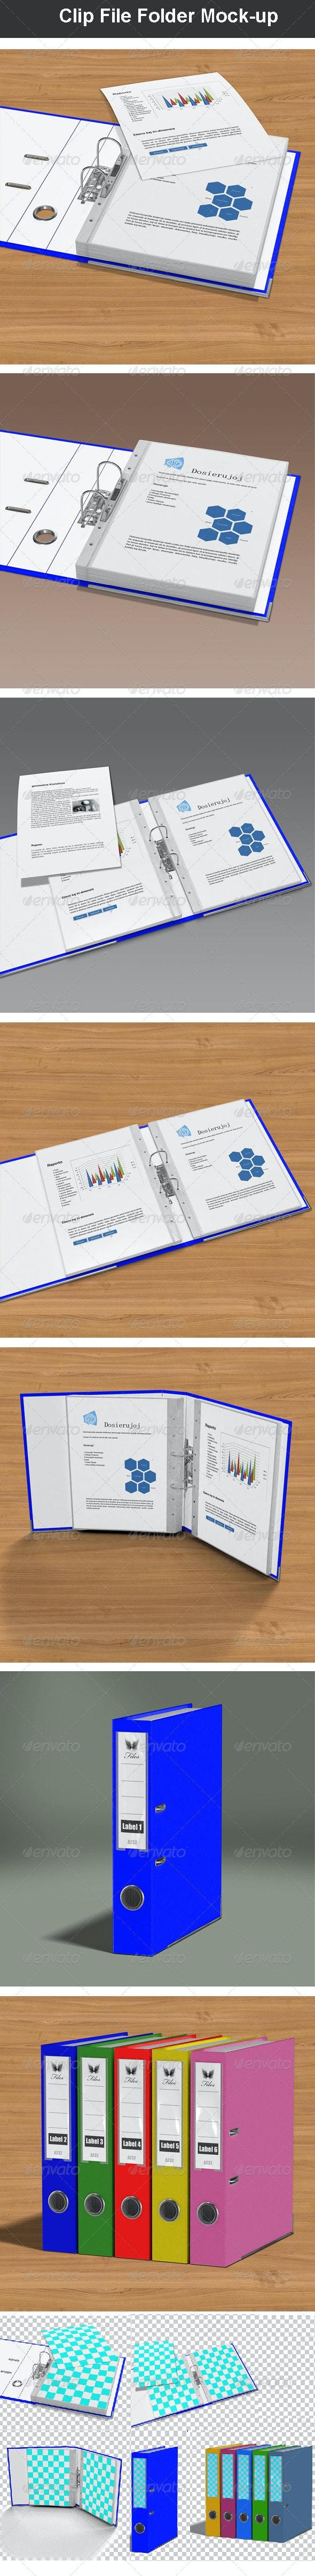 Clip File Folder Mock-up - Miscellaneous Print